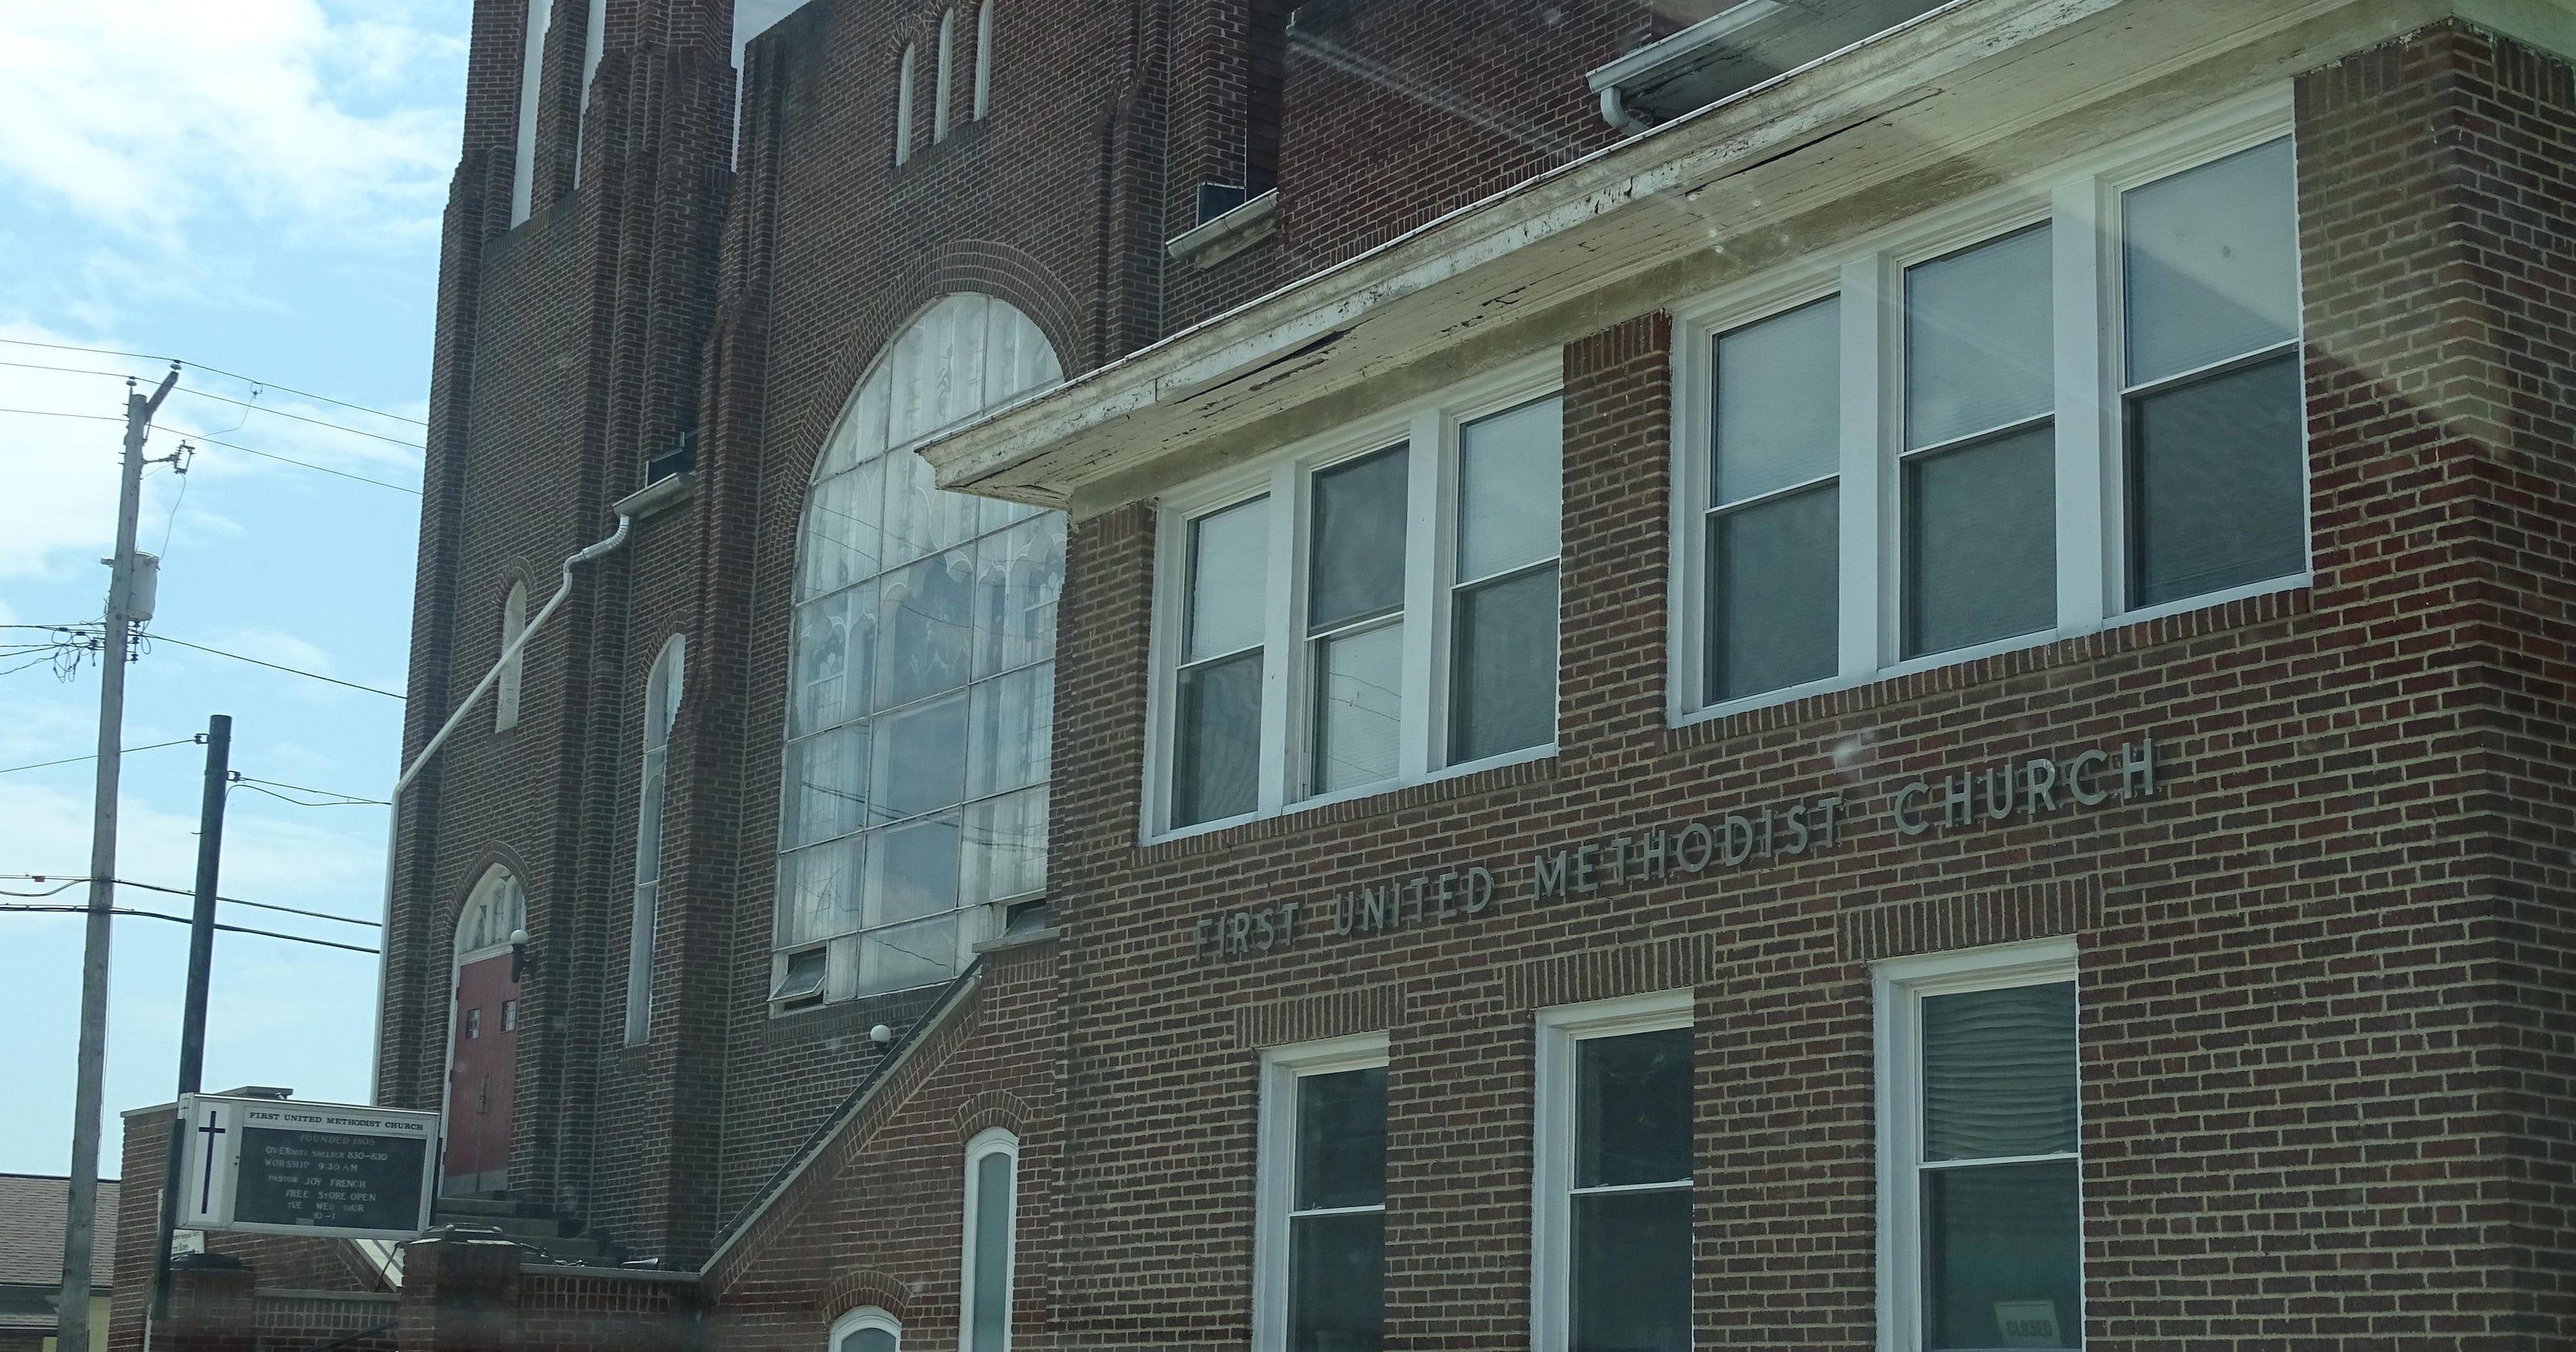 807598483 Problems persist near Putnam Avenue homeless shelter